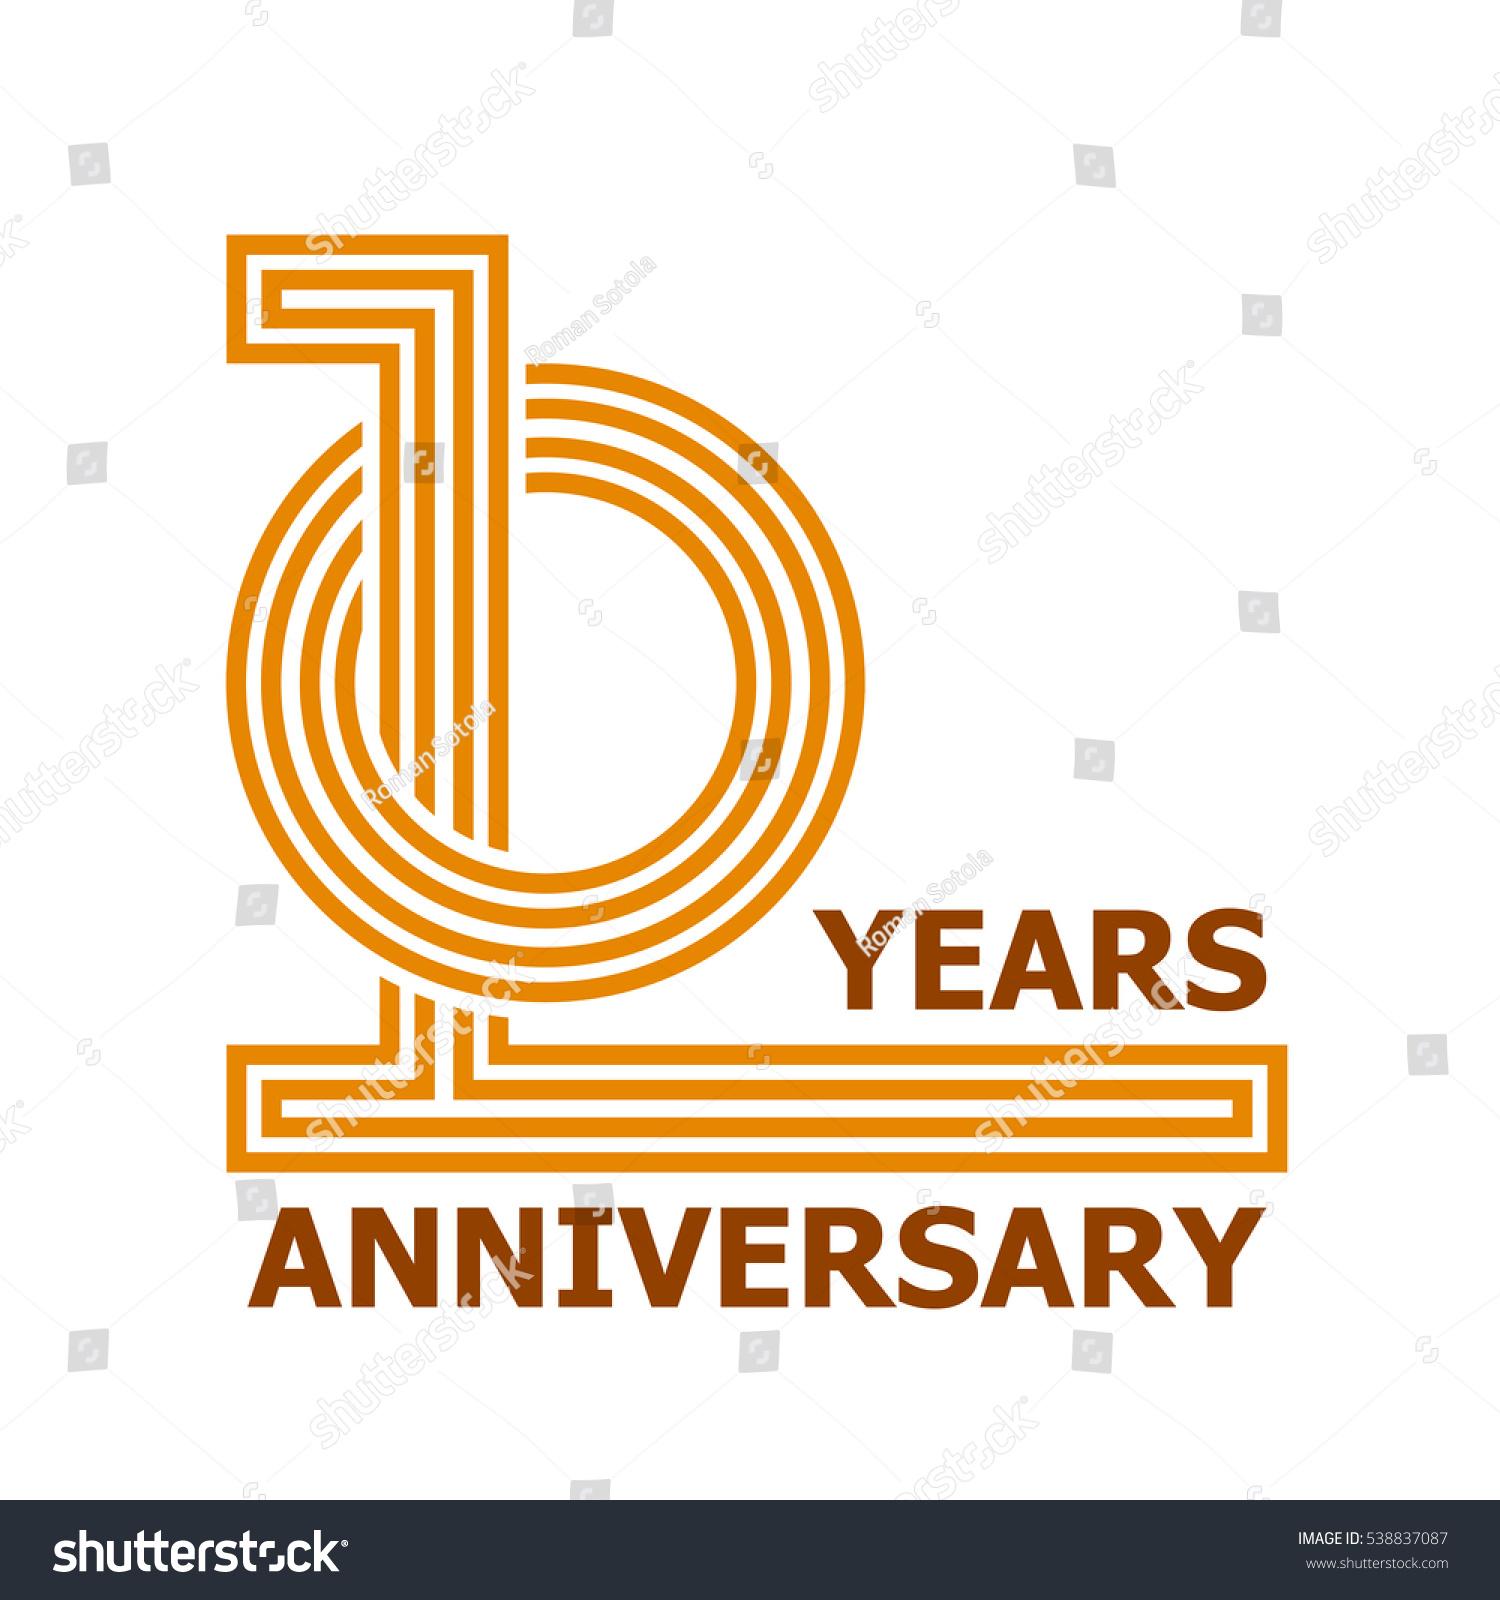 10 Years Anniversary Symbol Vector Stock Vector Royalty Free